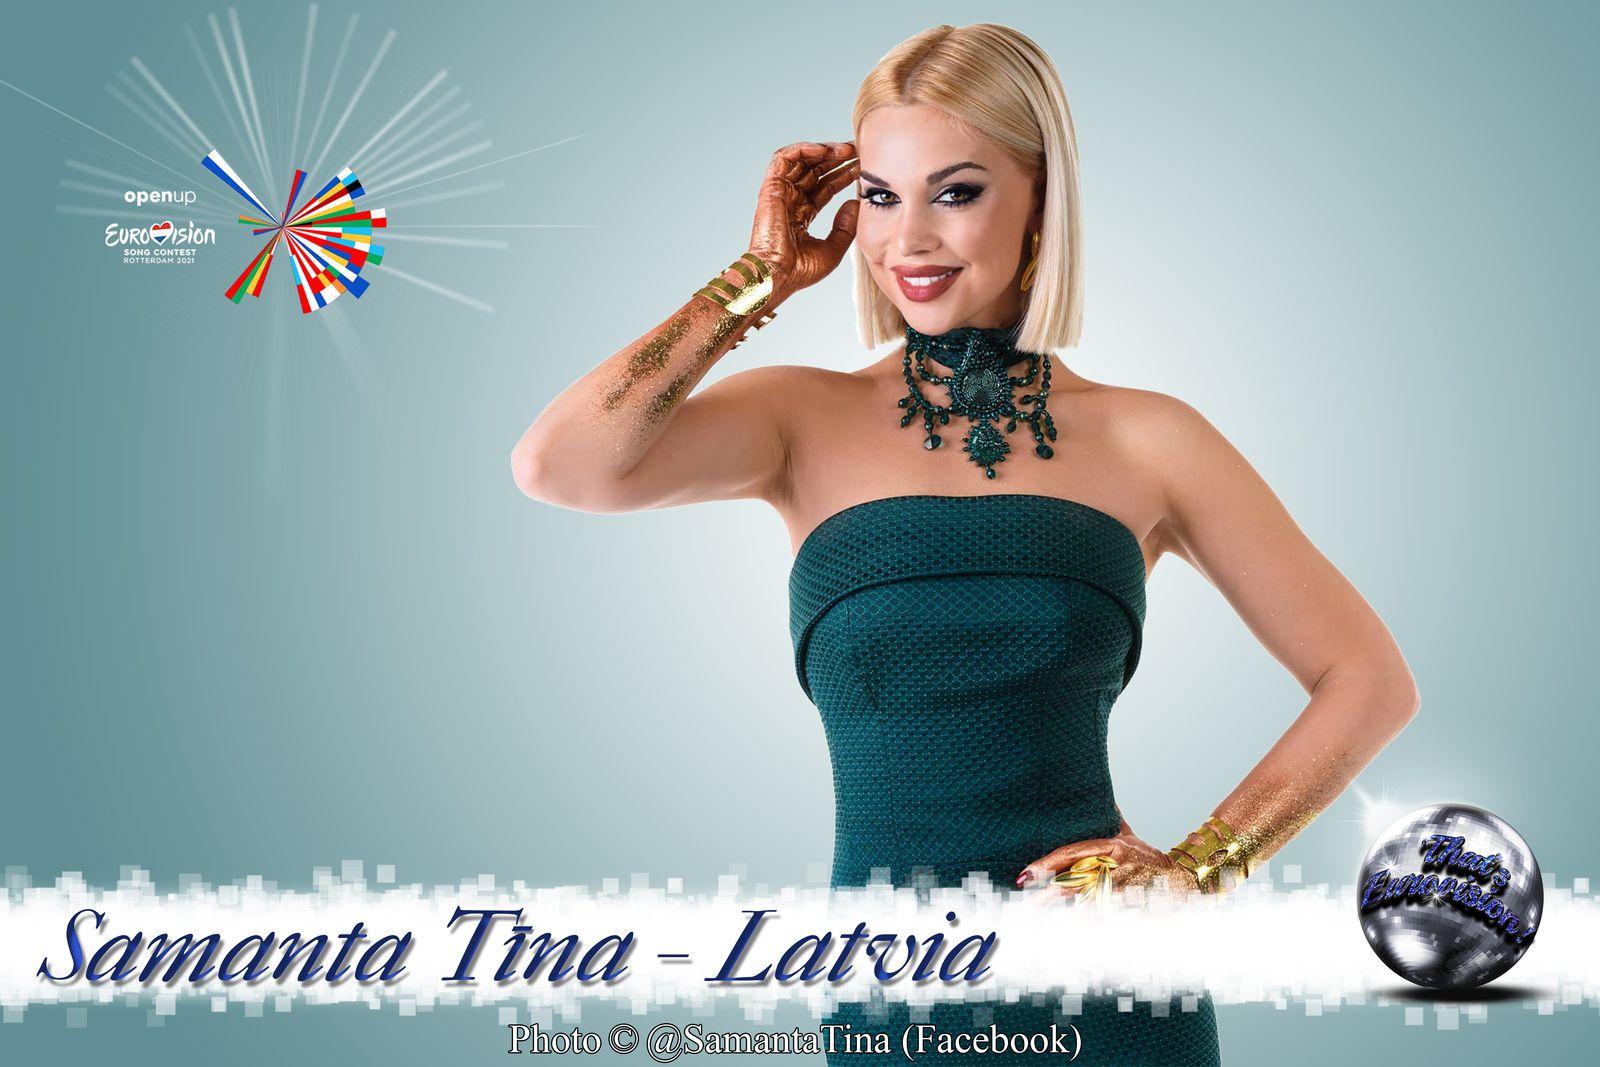 Latvia 2021 - Samanta Tīna (The Moon is Rising)